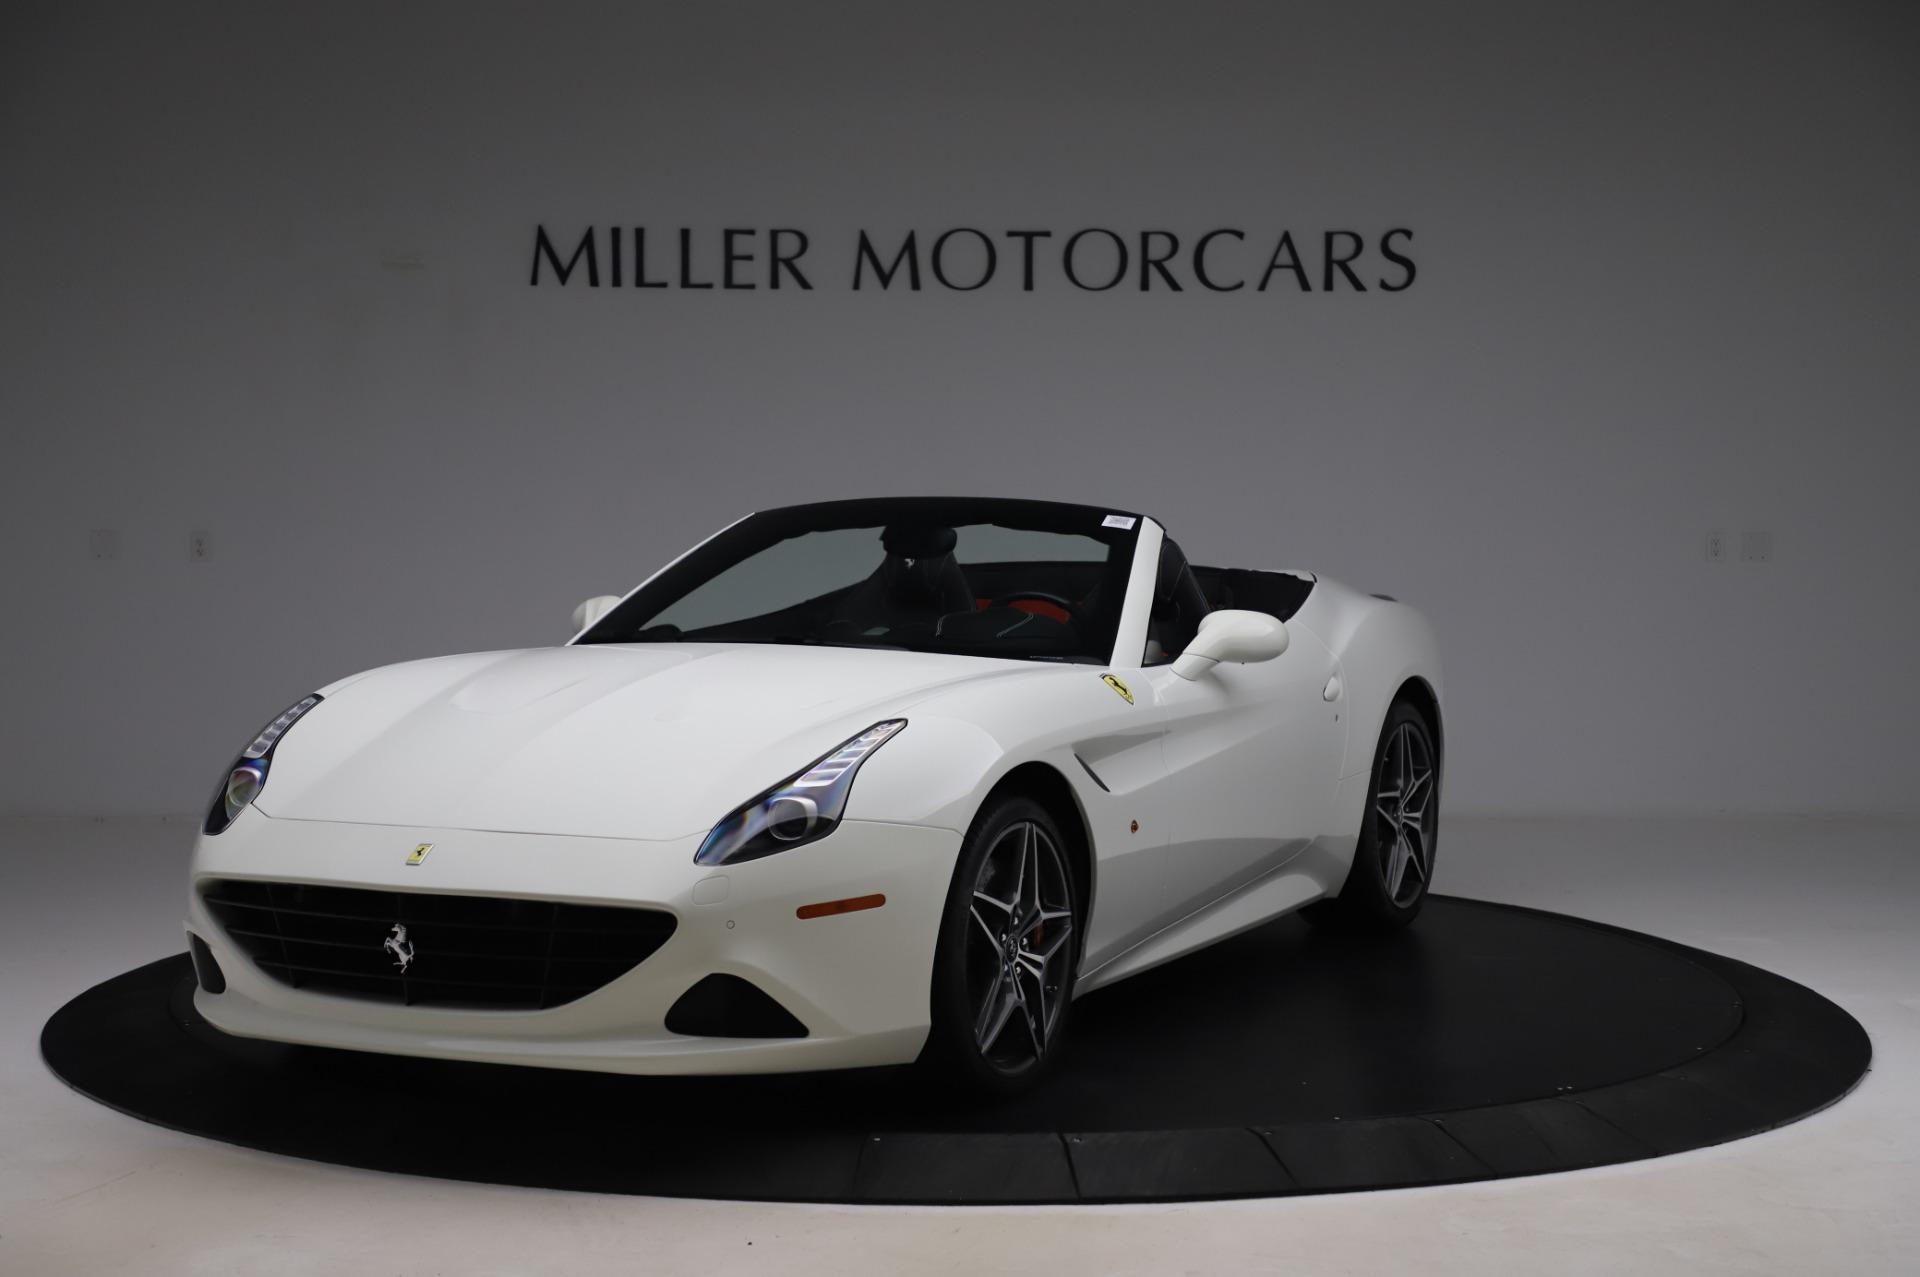 Used 2015 Ferrari California T for sale $159,900 at Rolls-Royce Motor Cars Greenwich in Greenwich CT 06830 1